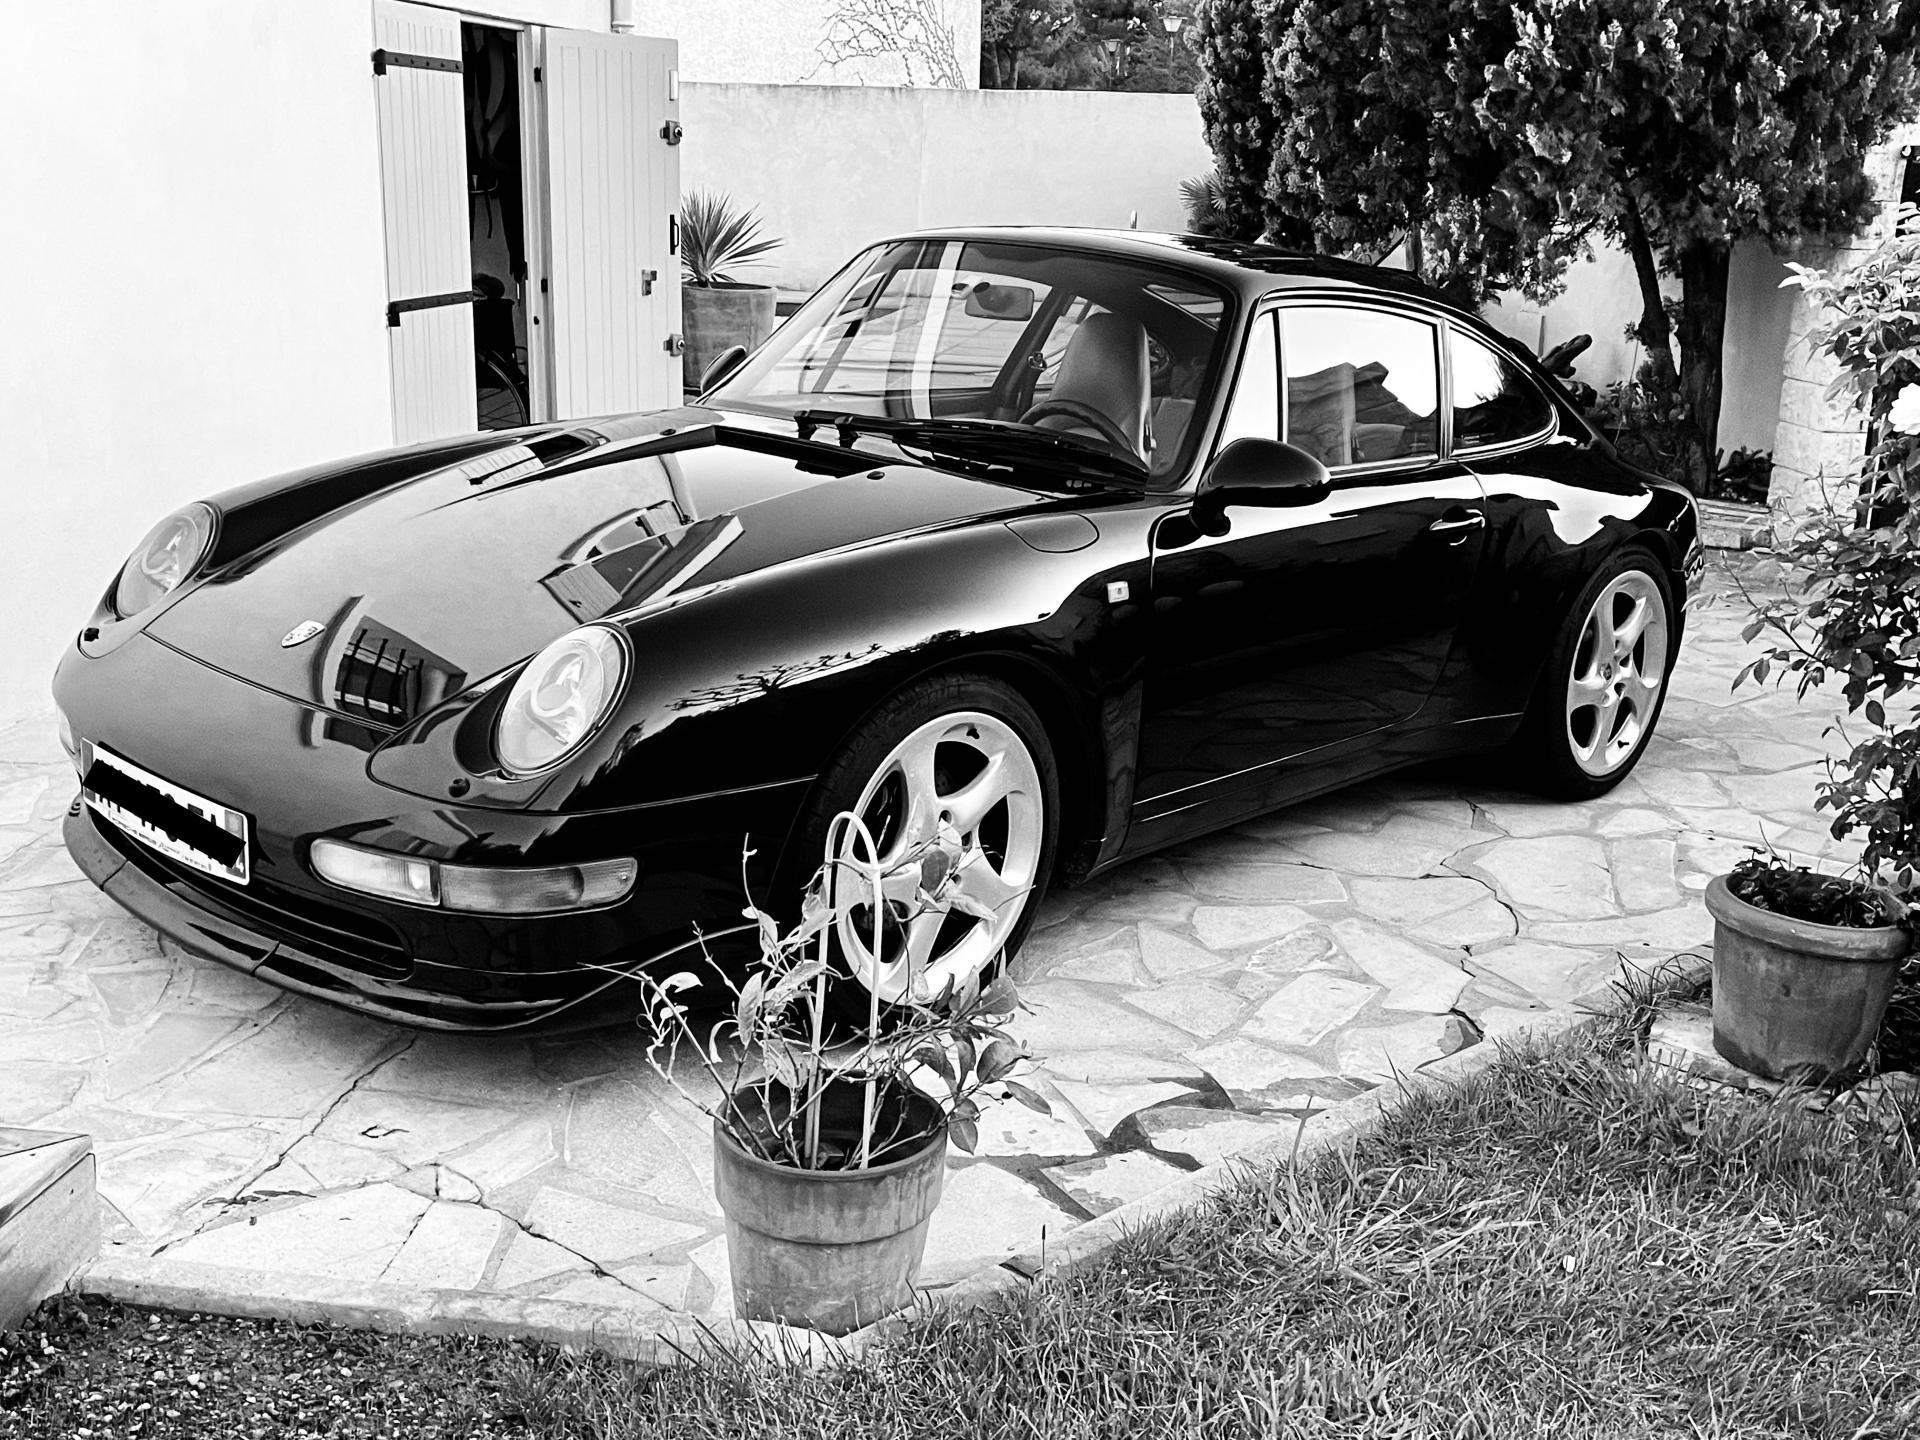 Porsche 993 285 ch Carrera 2 (Porsche 993)